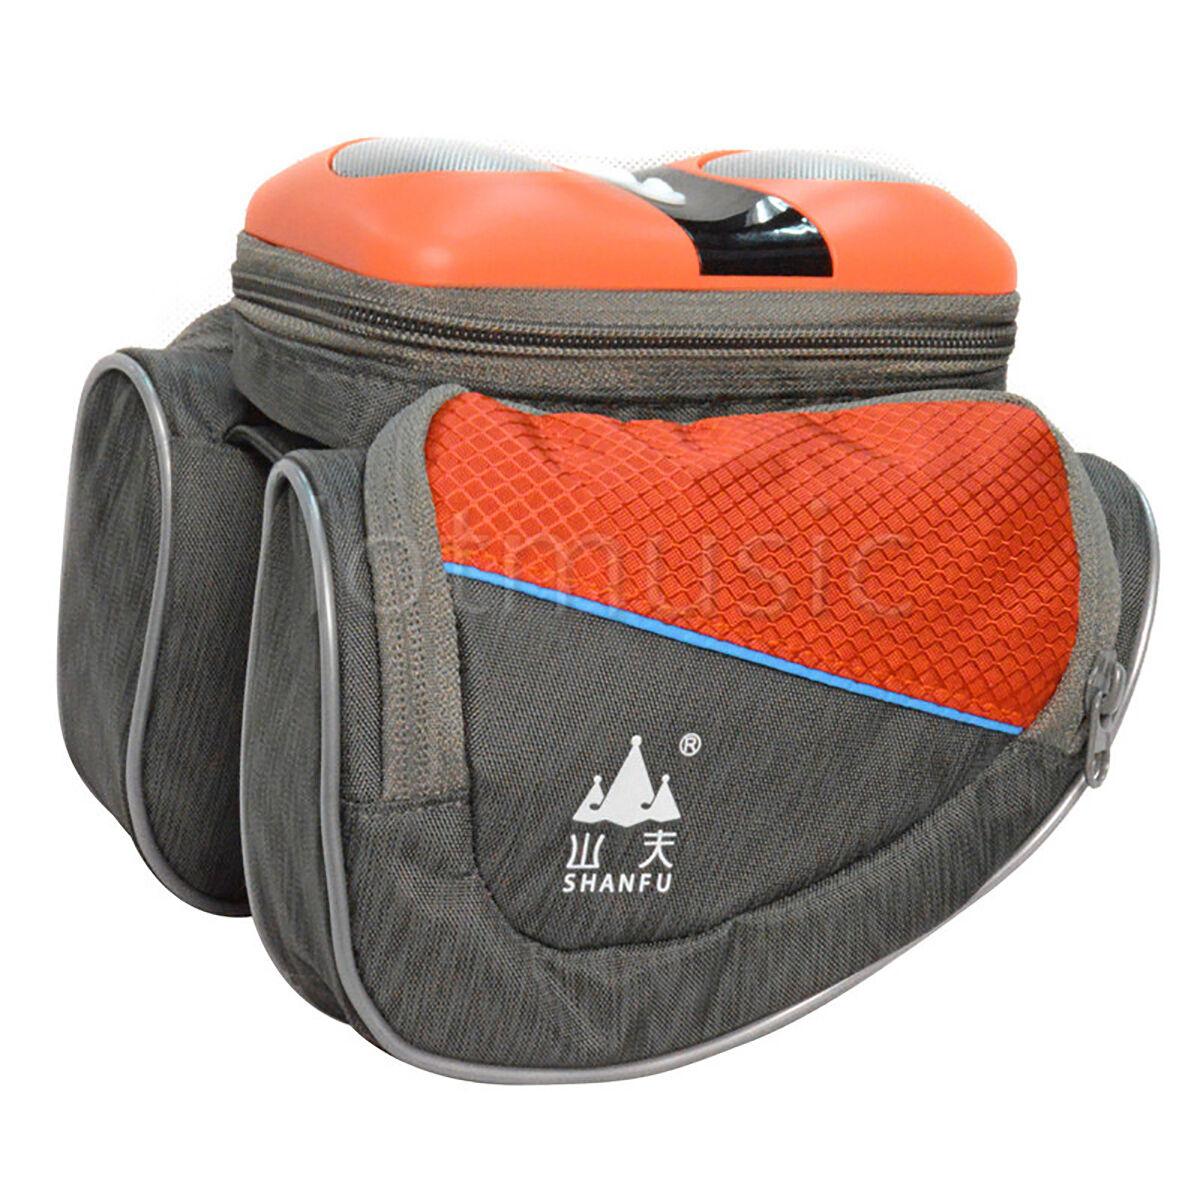 Cycling Bike Triangle Frame  Pannier Stereo Speaker Front Tube Saddle Bag orange  hot sales